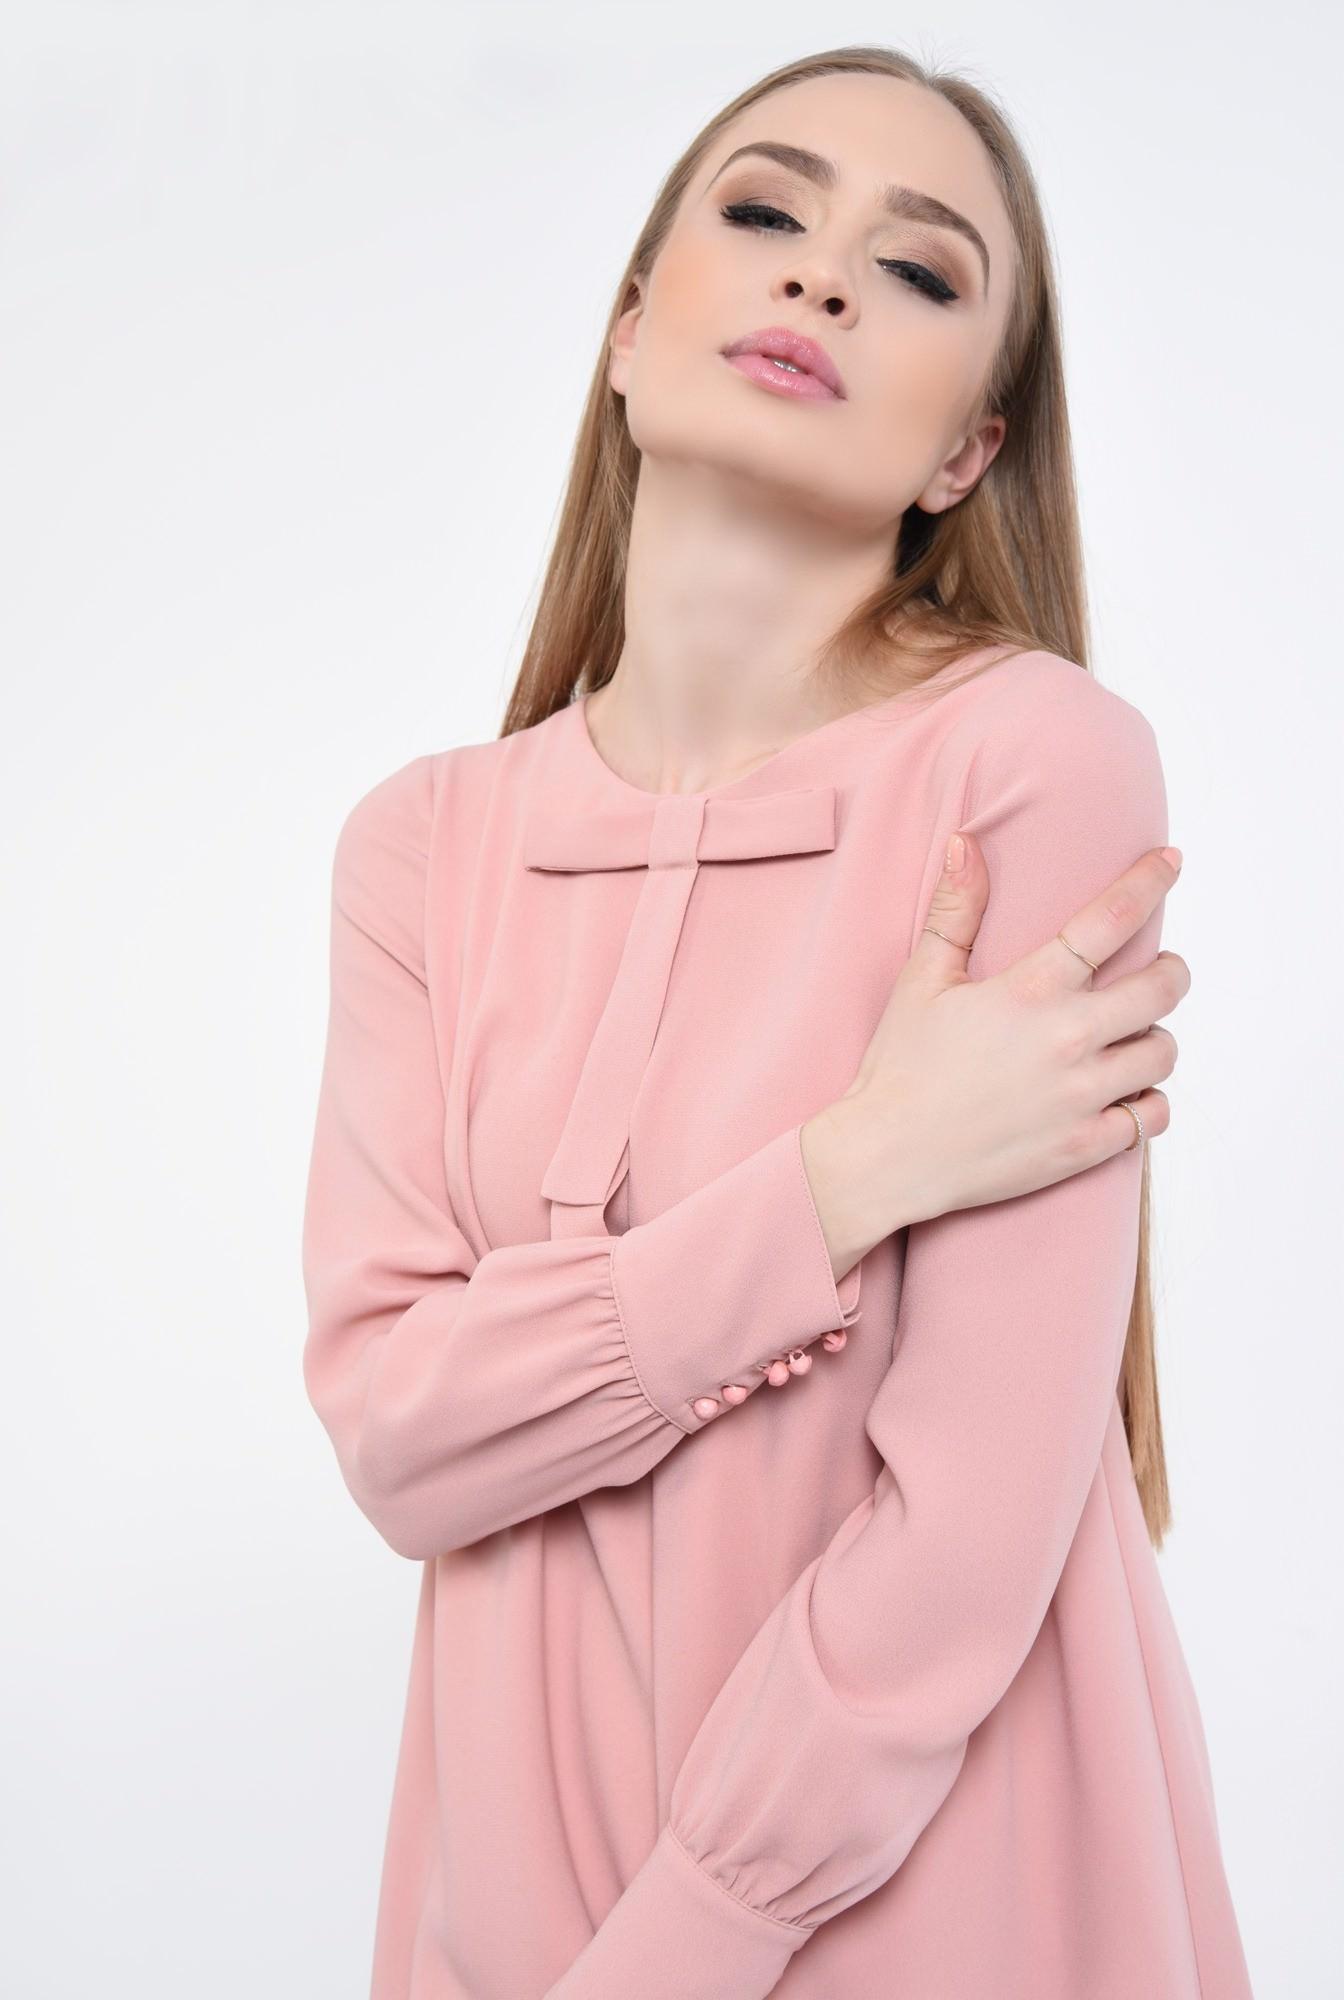 2 - Rochie de zi scurta, roz